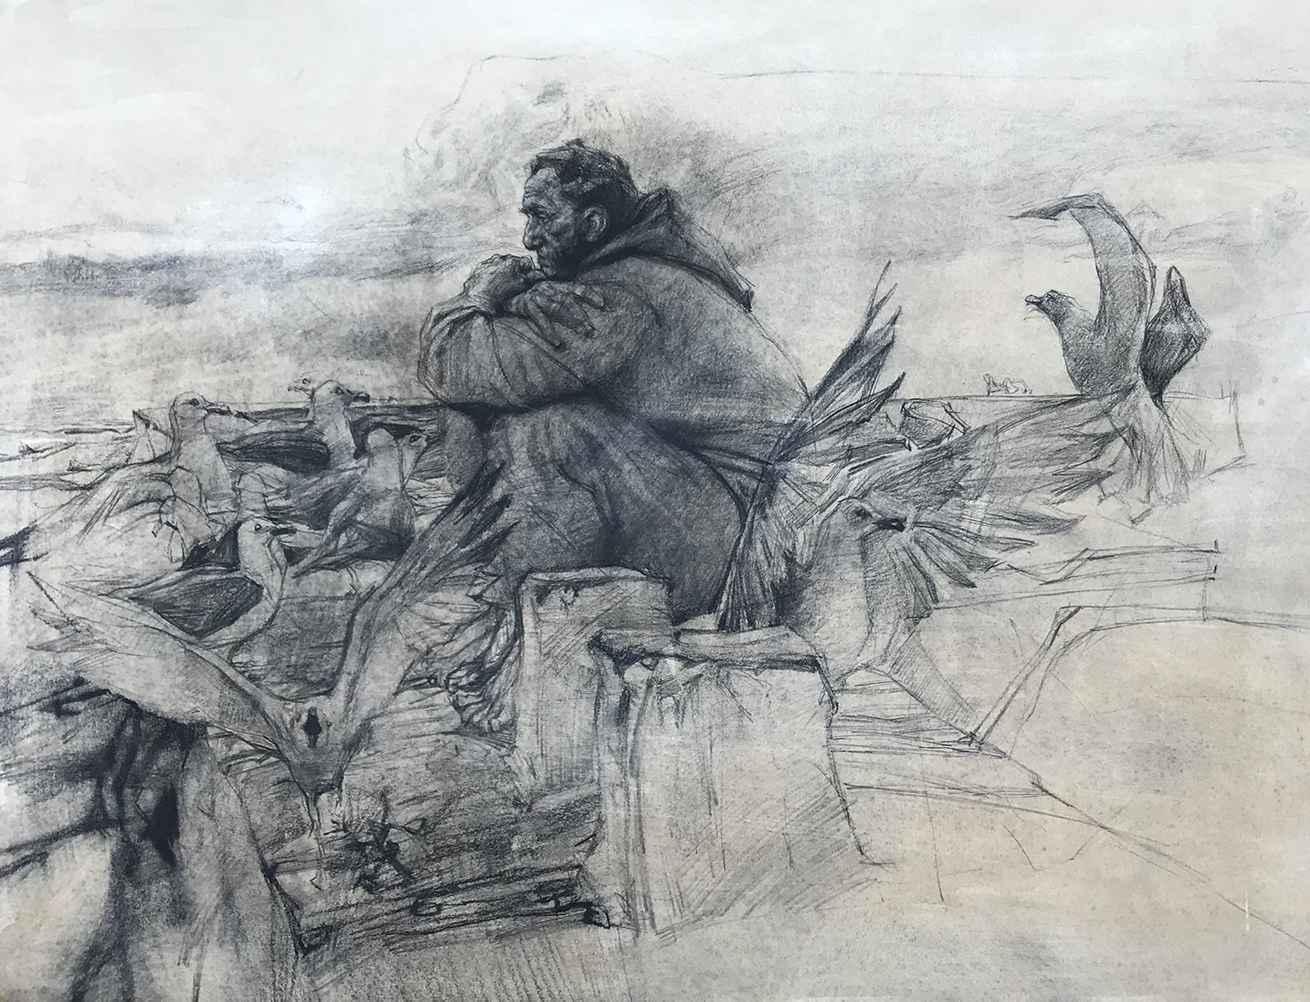 Seaman by  Daud Akhriev - Masterpiece Online